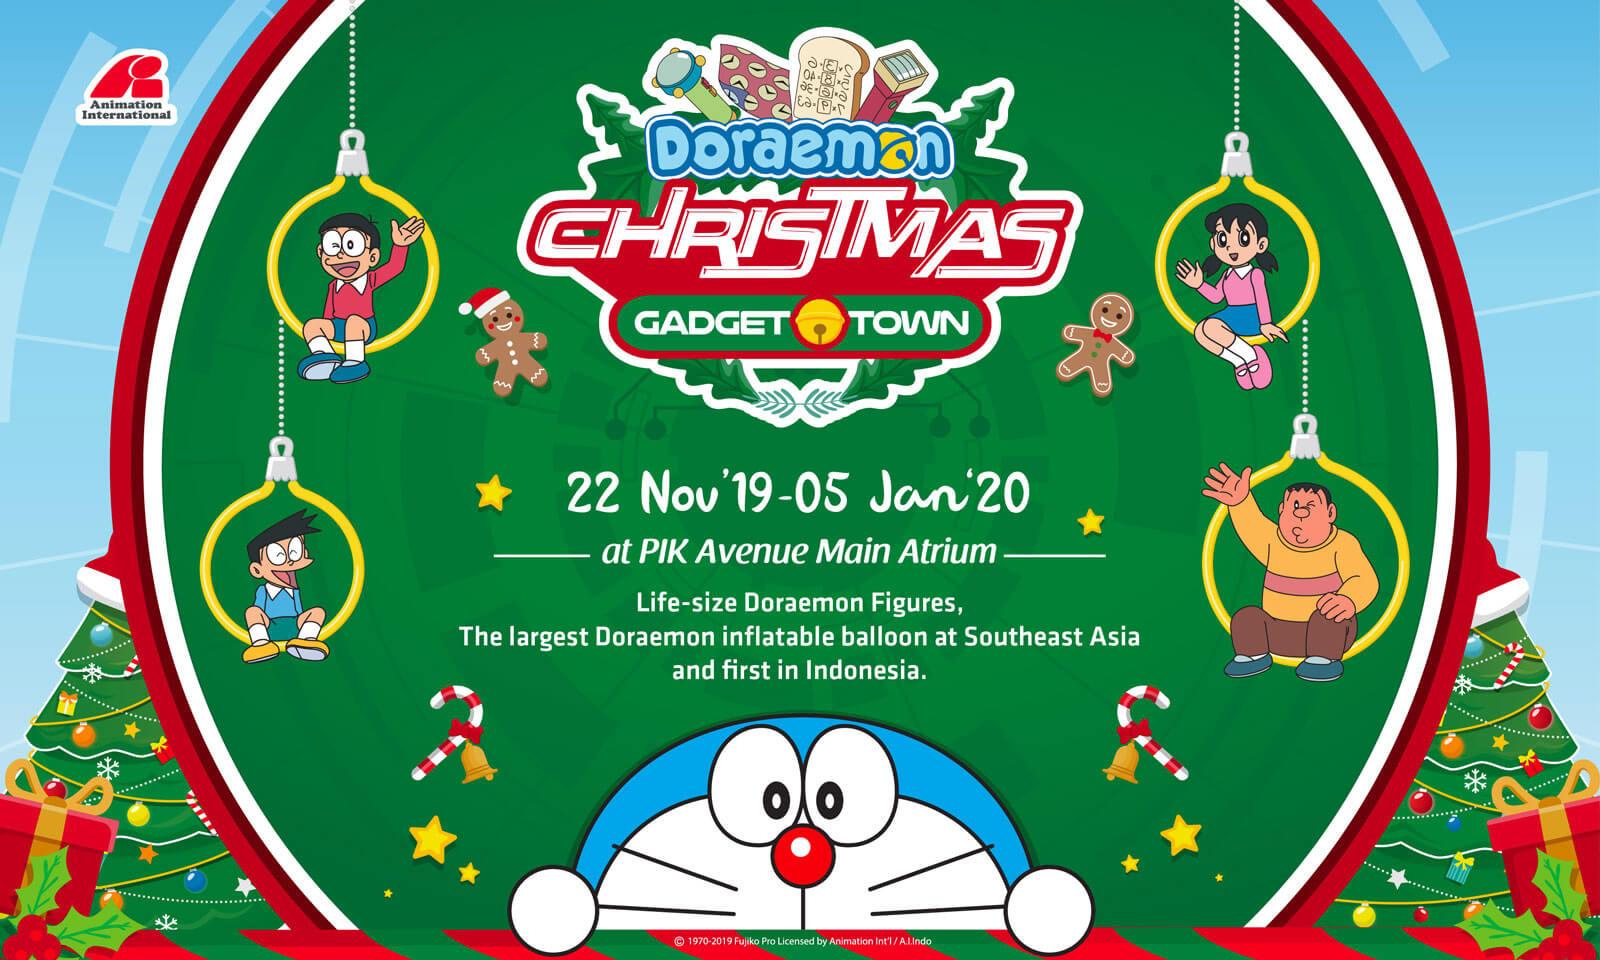 Doraemon Christmas Gadget Town